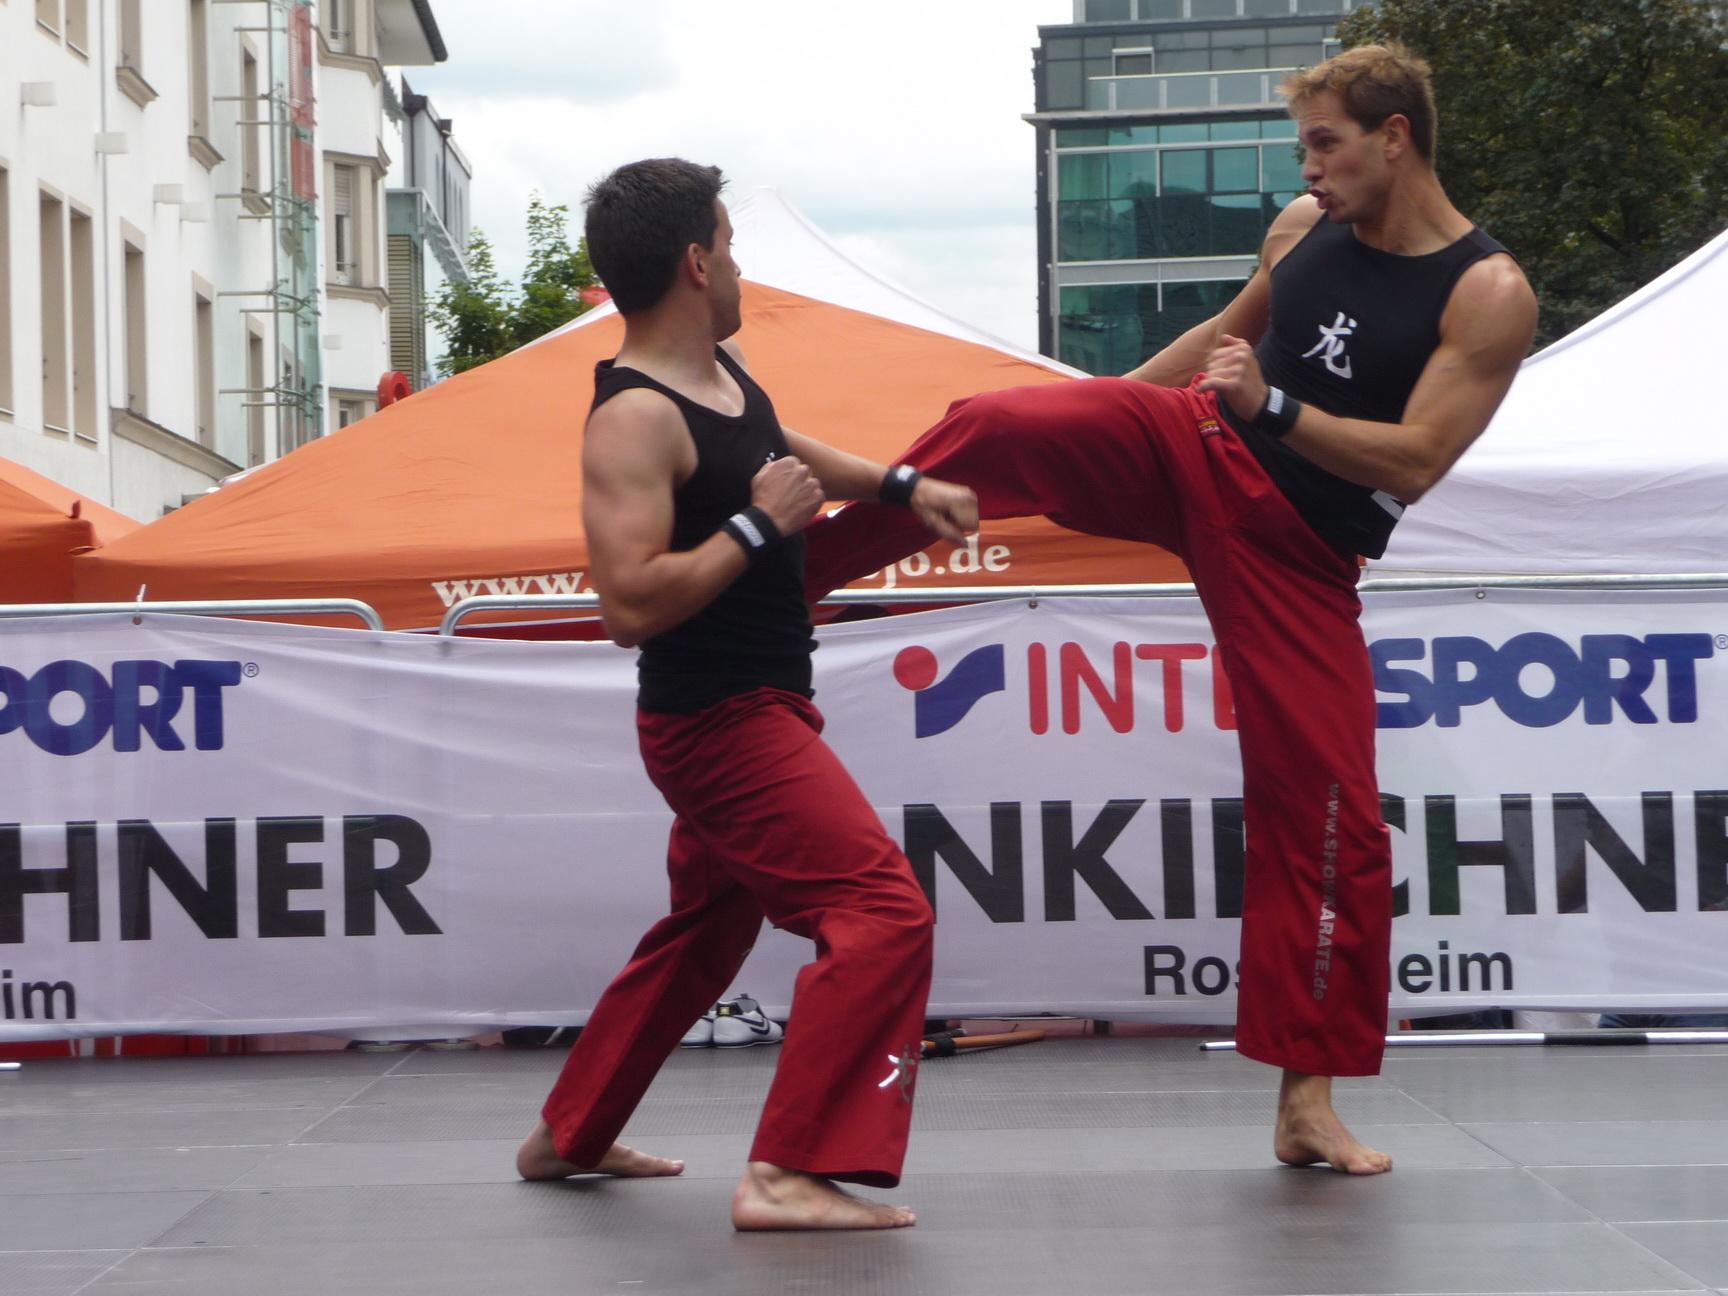 Stadtfest2011_06